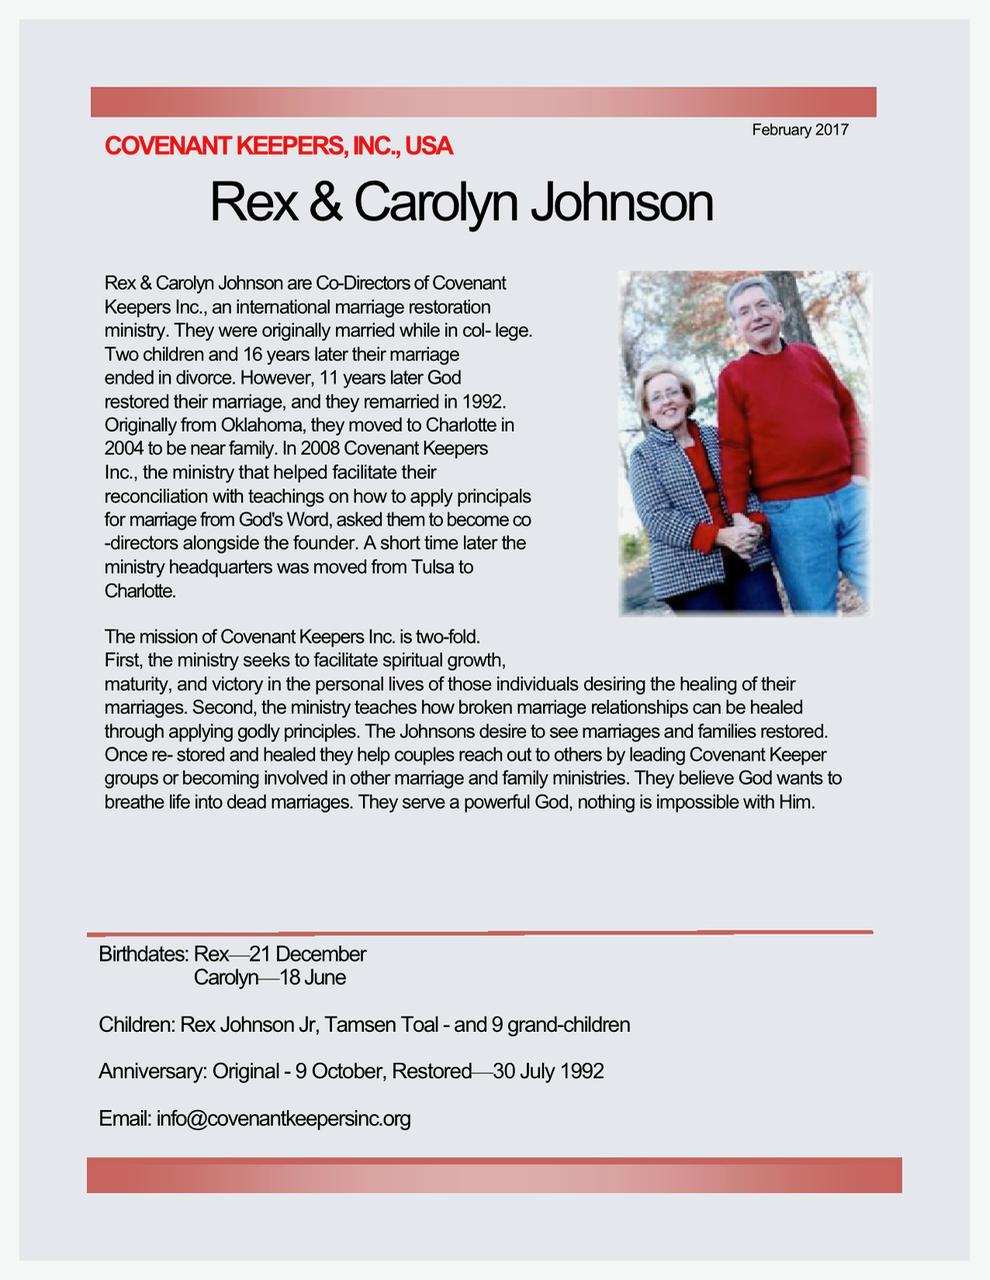 Rex and Carolyn Johnson